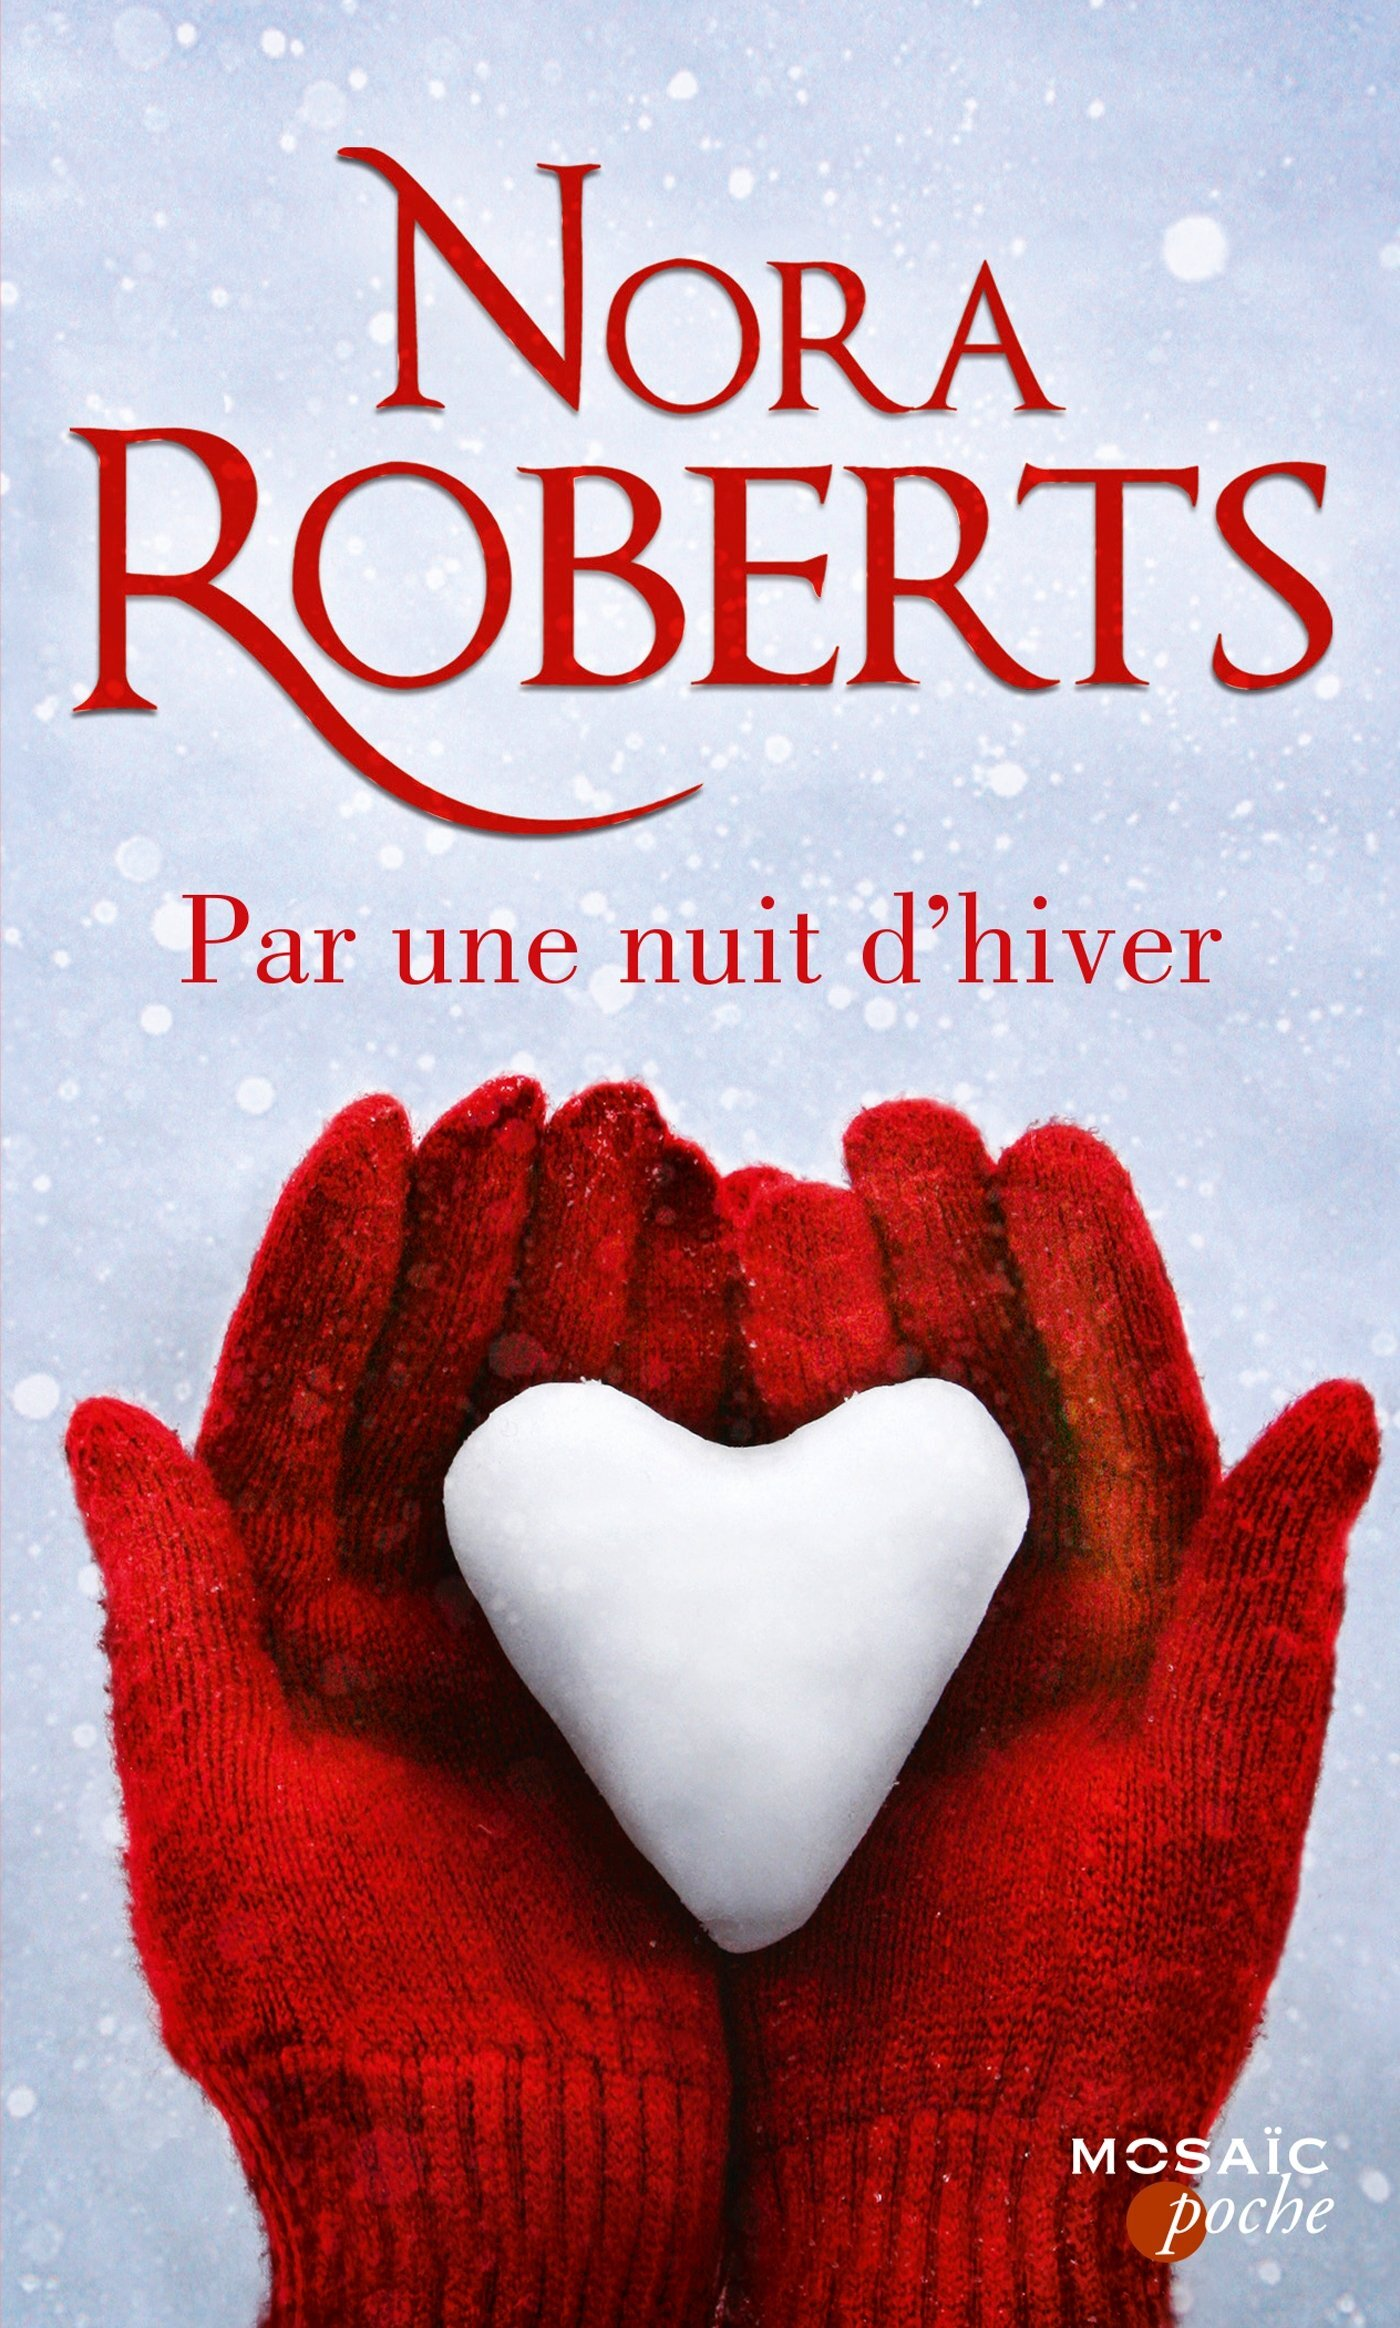 cdn1.booknode.com/book_cover/510/full/par-une-nuit-d-hiver-509658.jpg